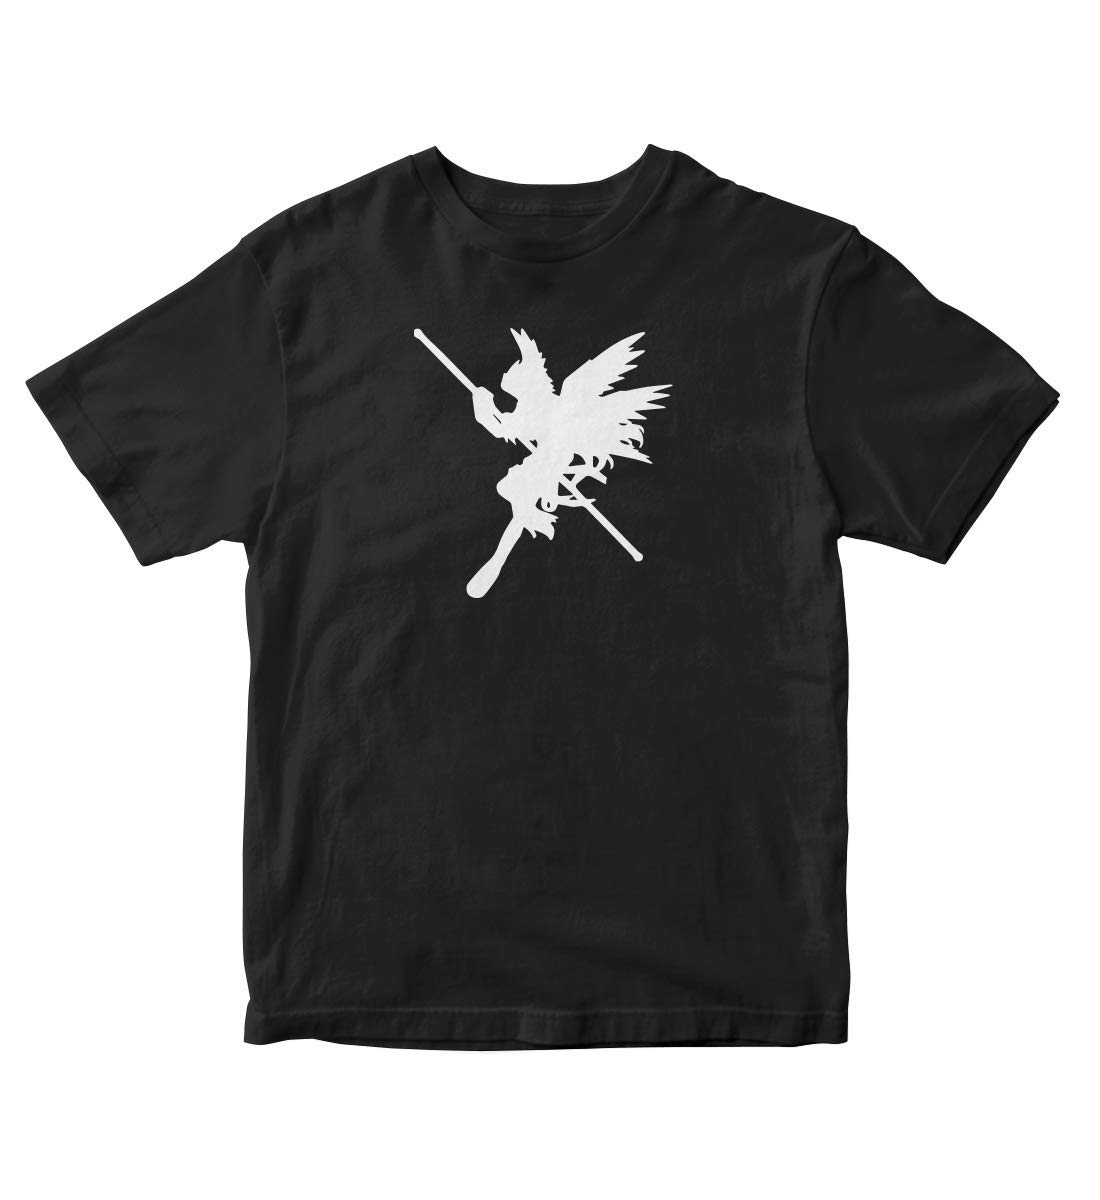 Patamon Digivolution Angemon Digimon Manga Anime Black Shirt S 73